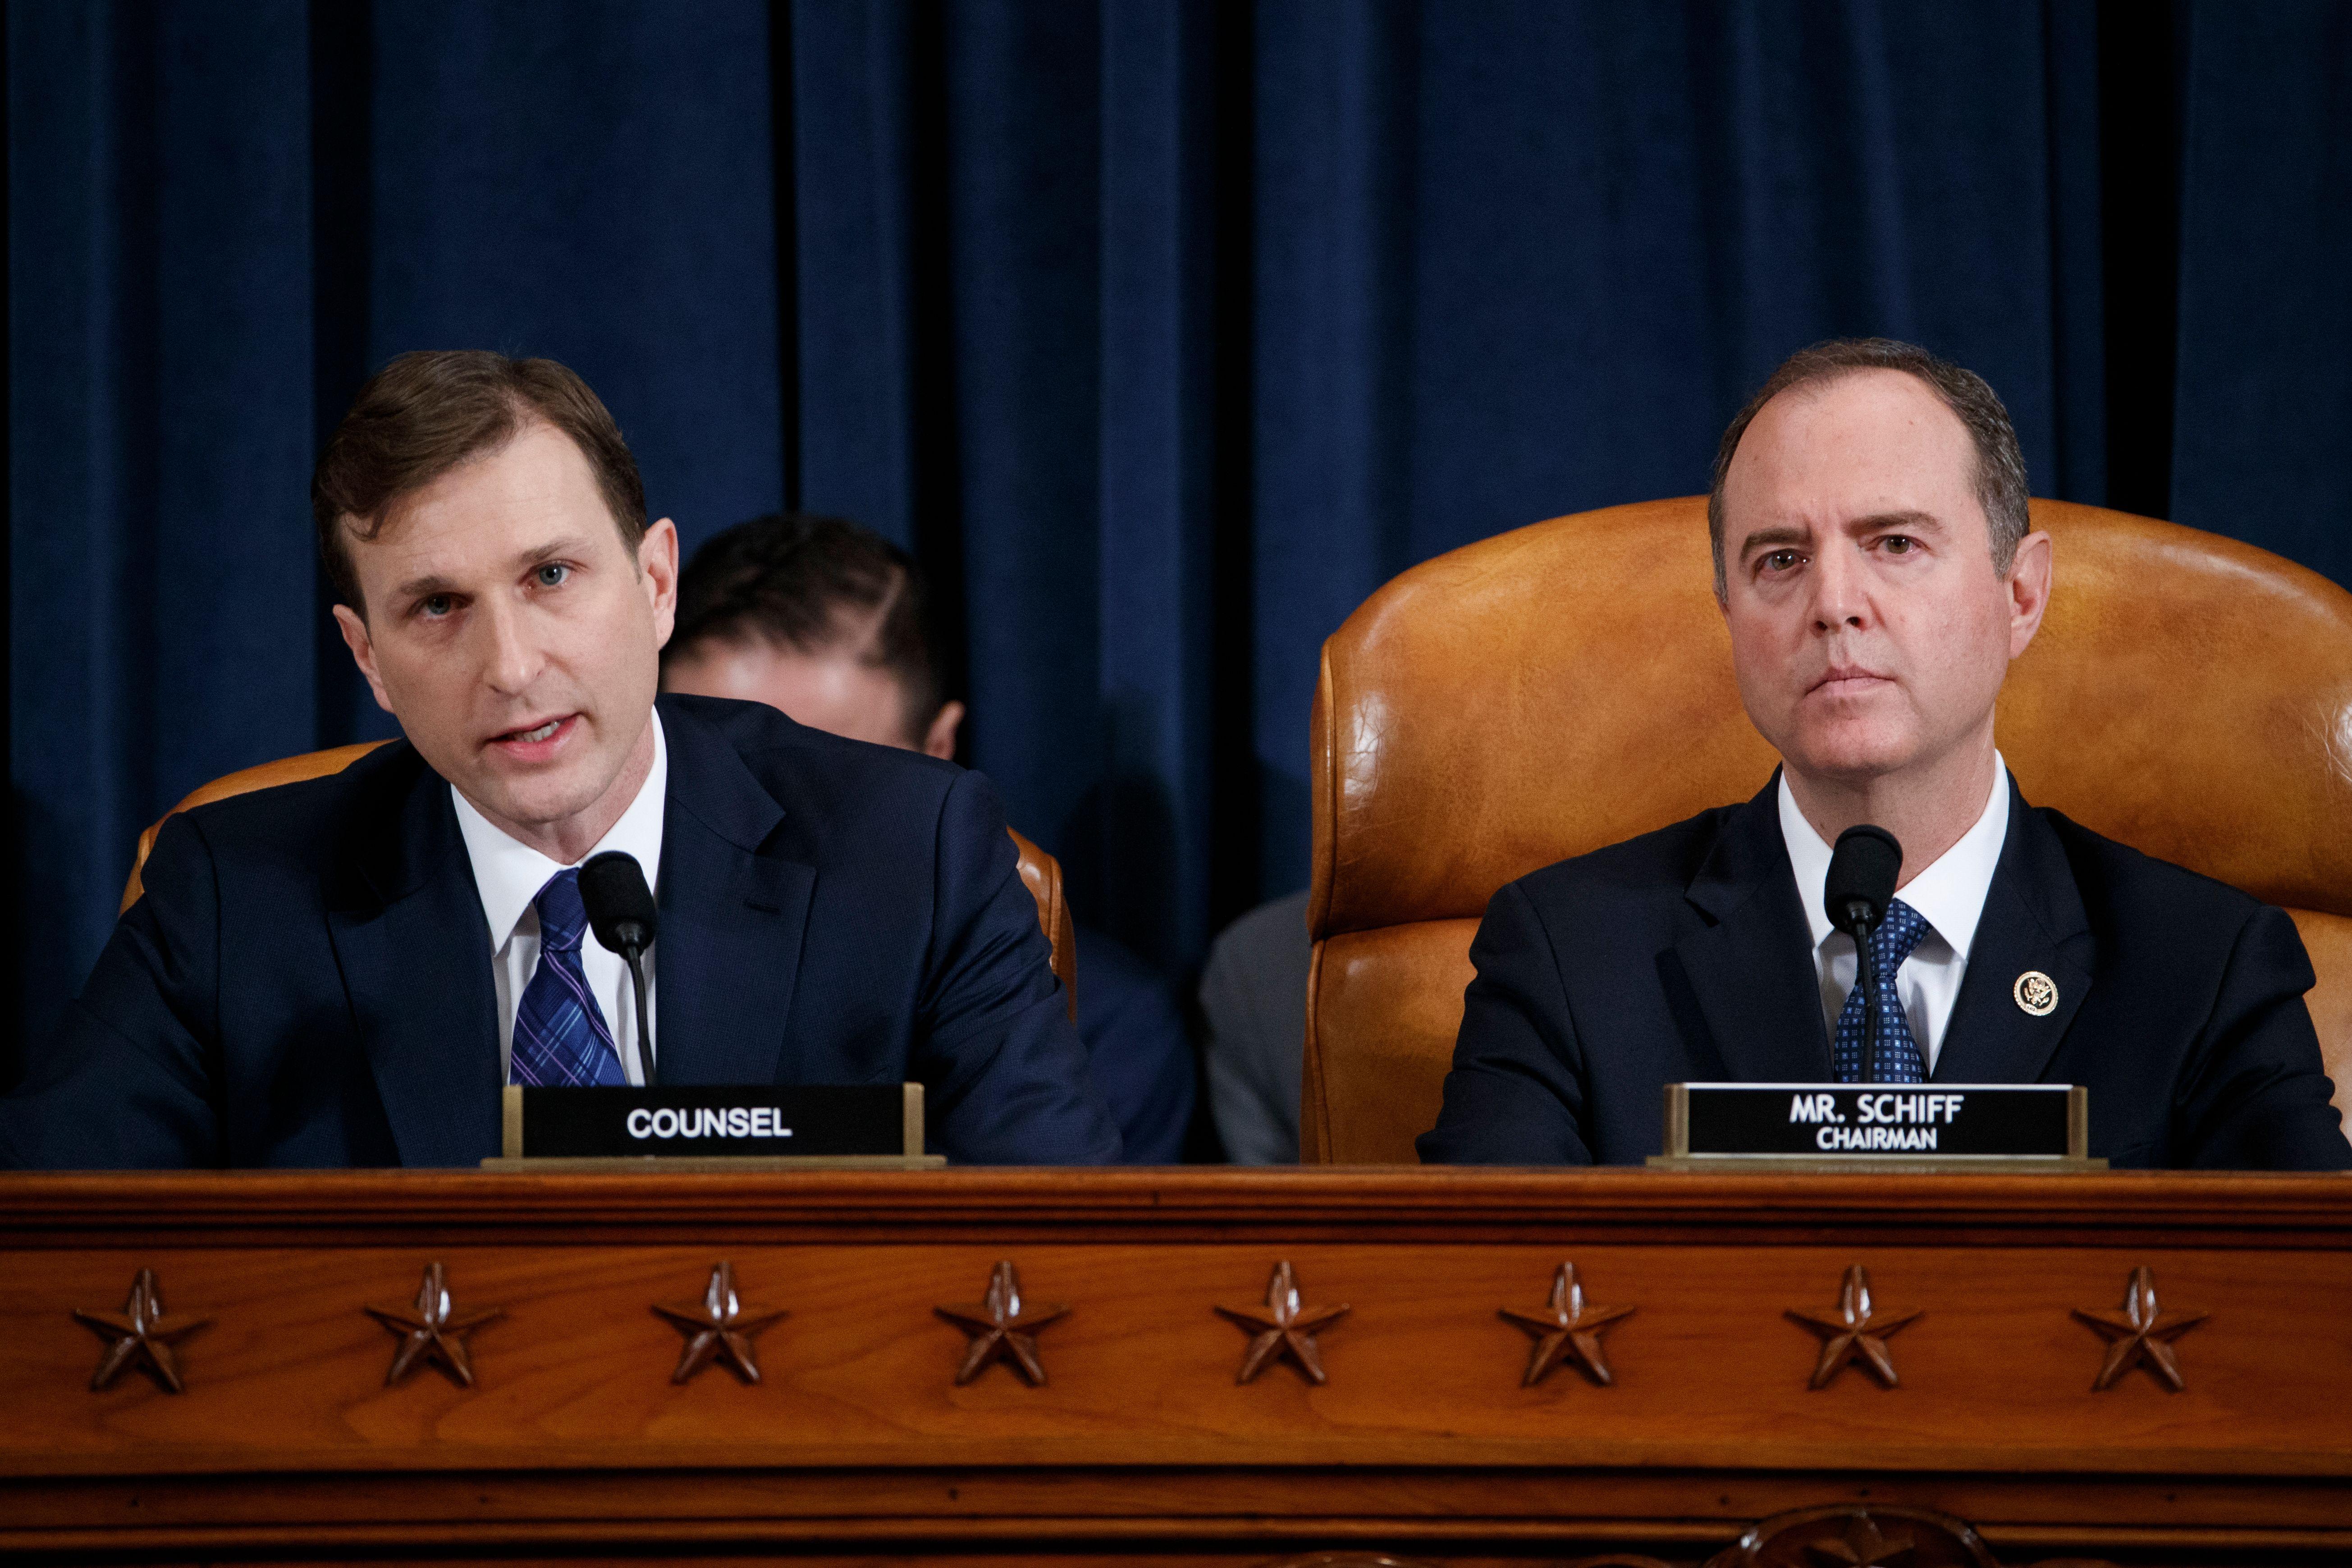 Daniel Goldman to depart House Intelligence Committee - Axios